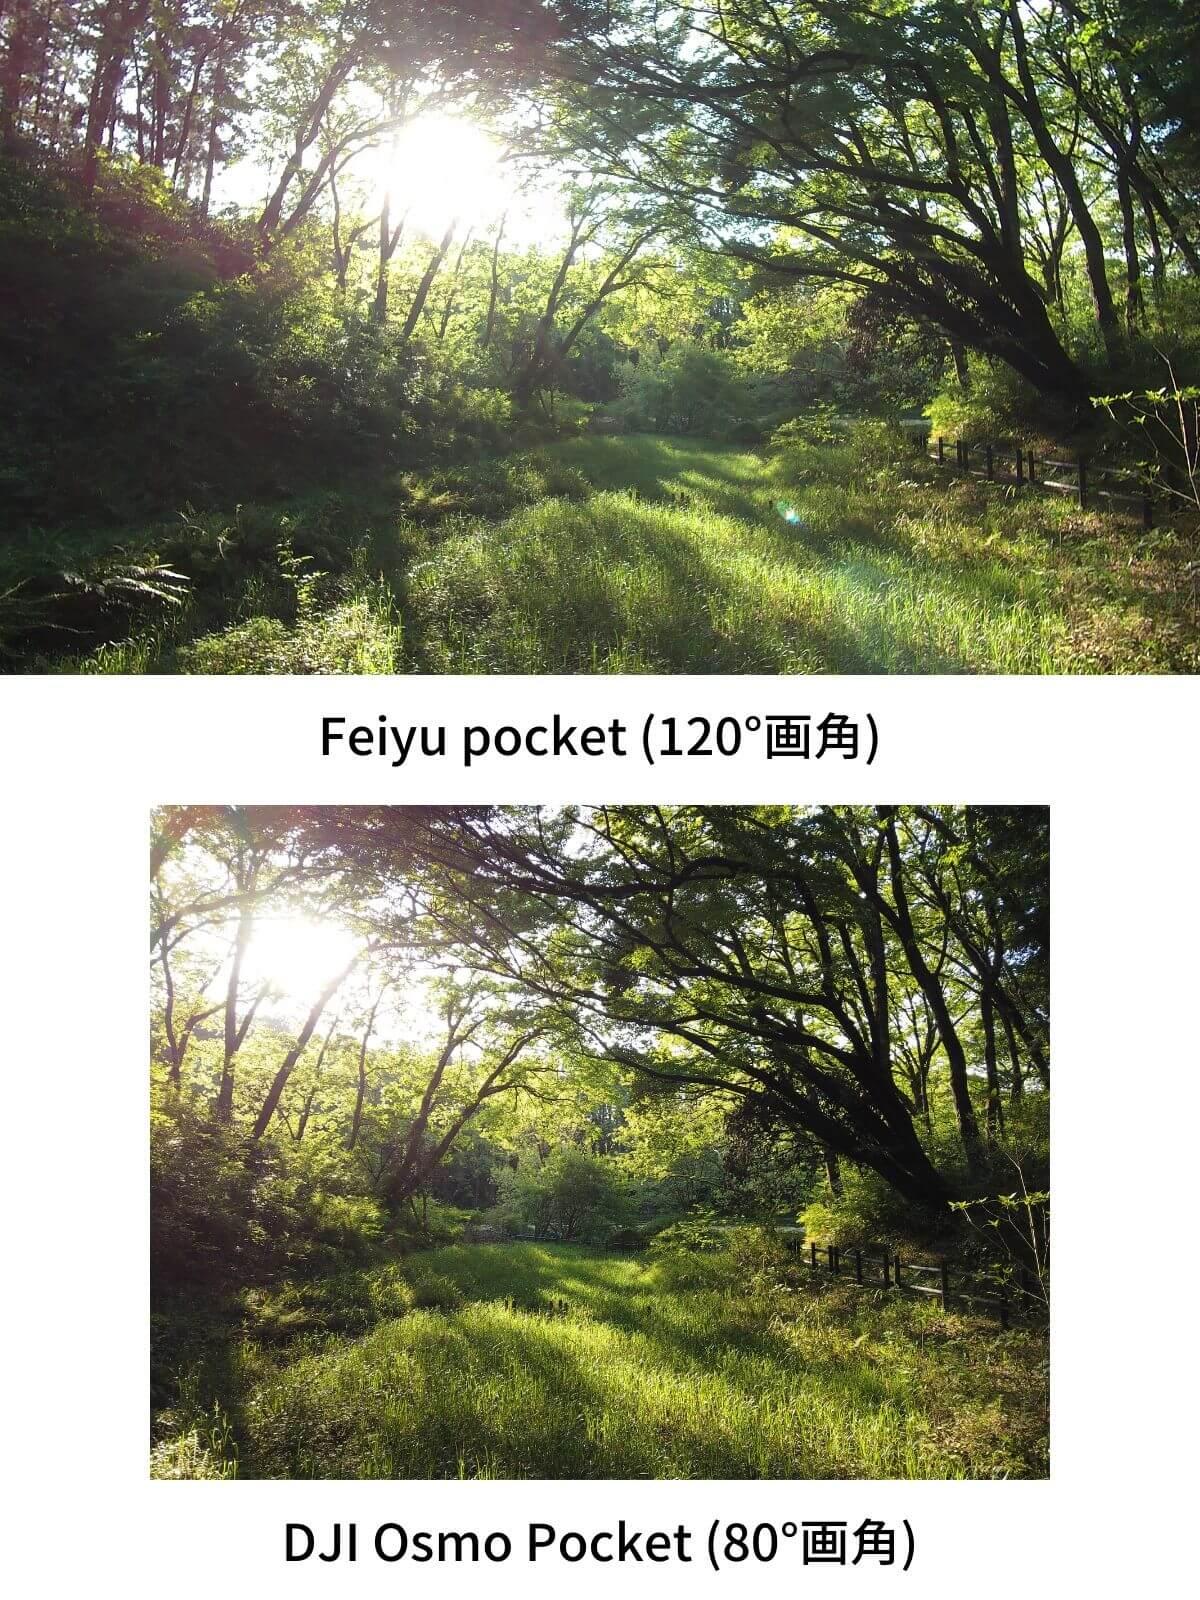 Feiyu pocket DJI Osmo Pocket 画角比較